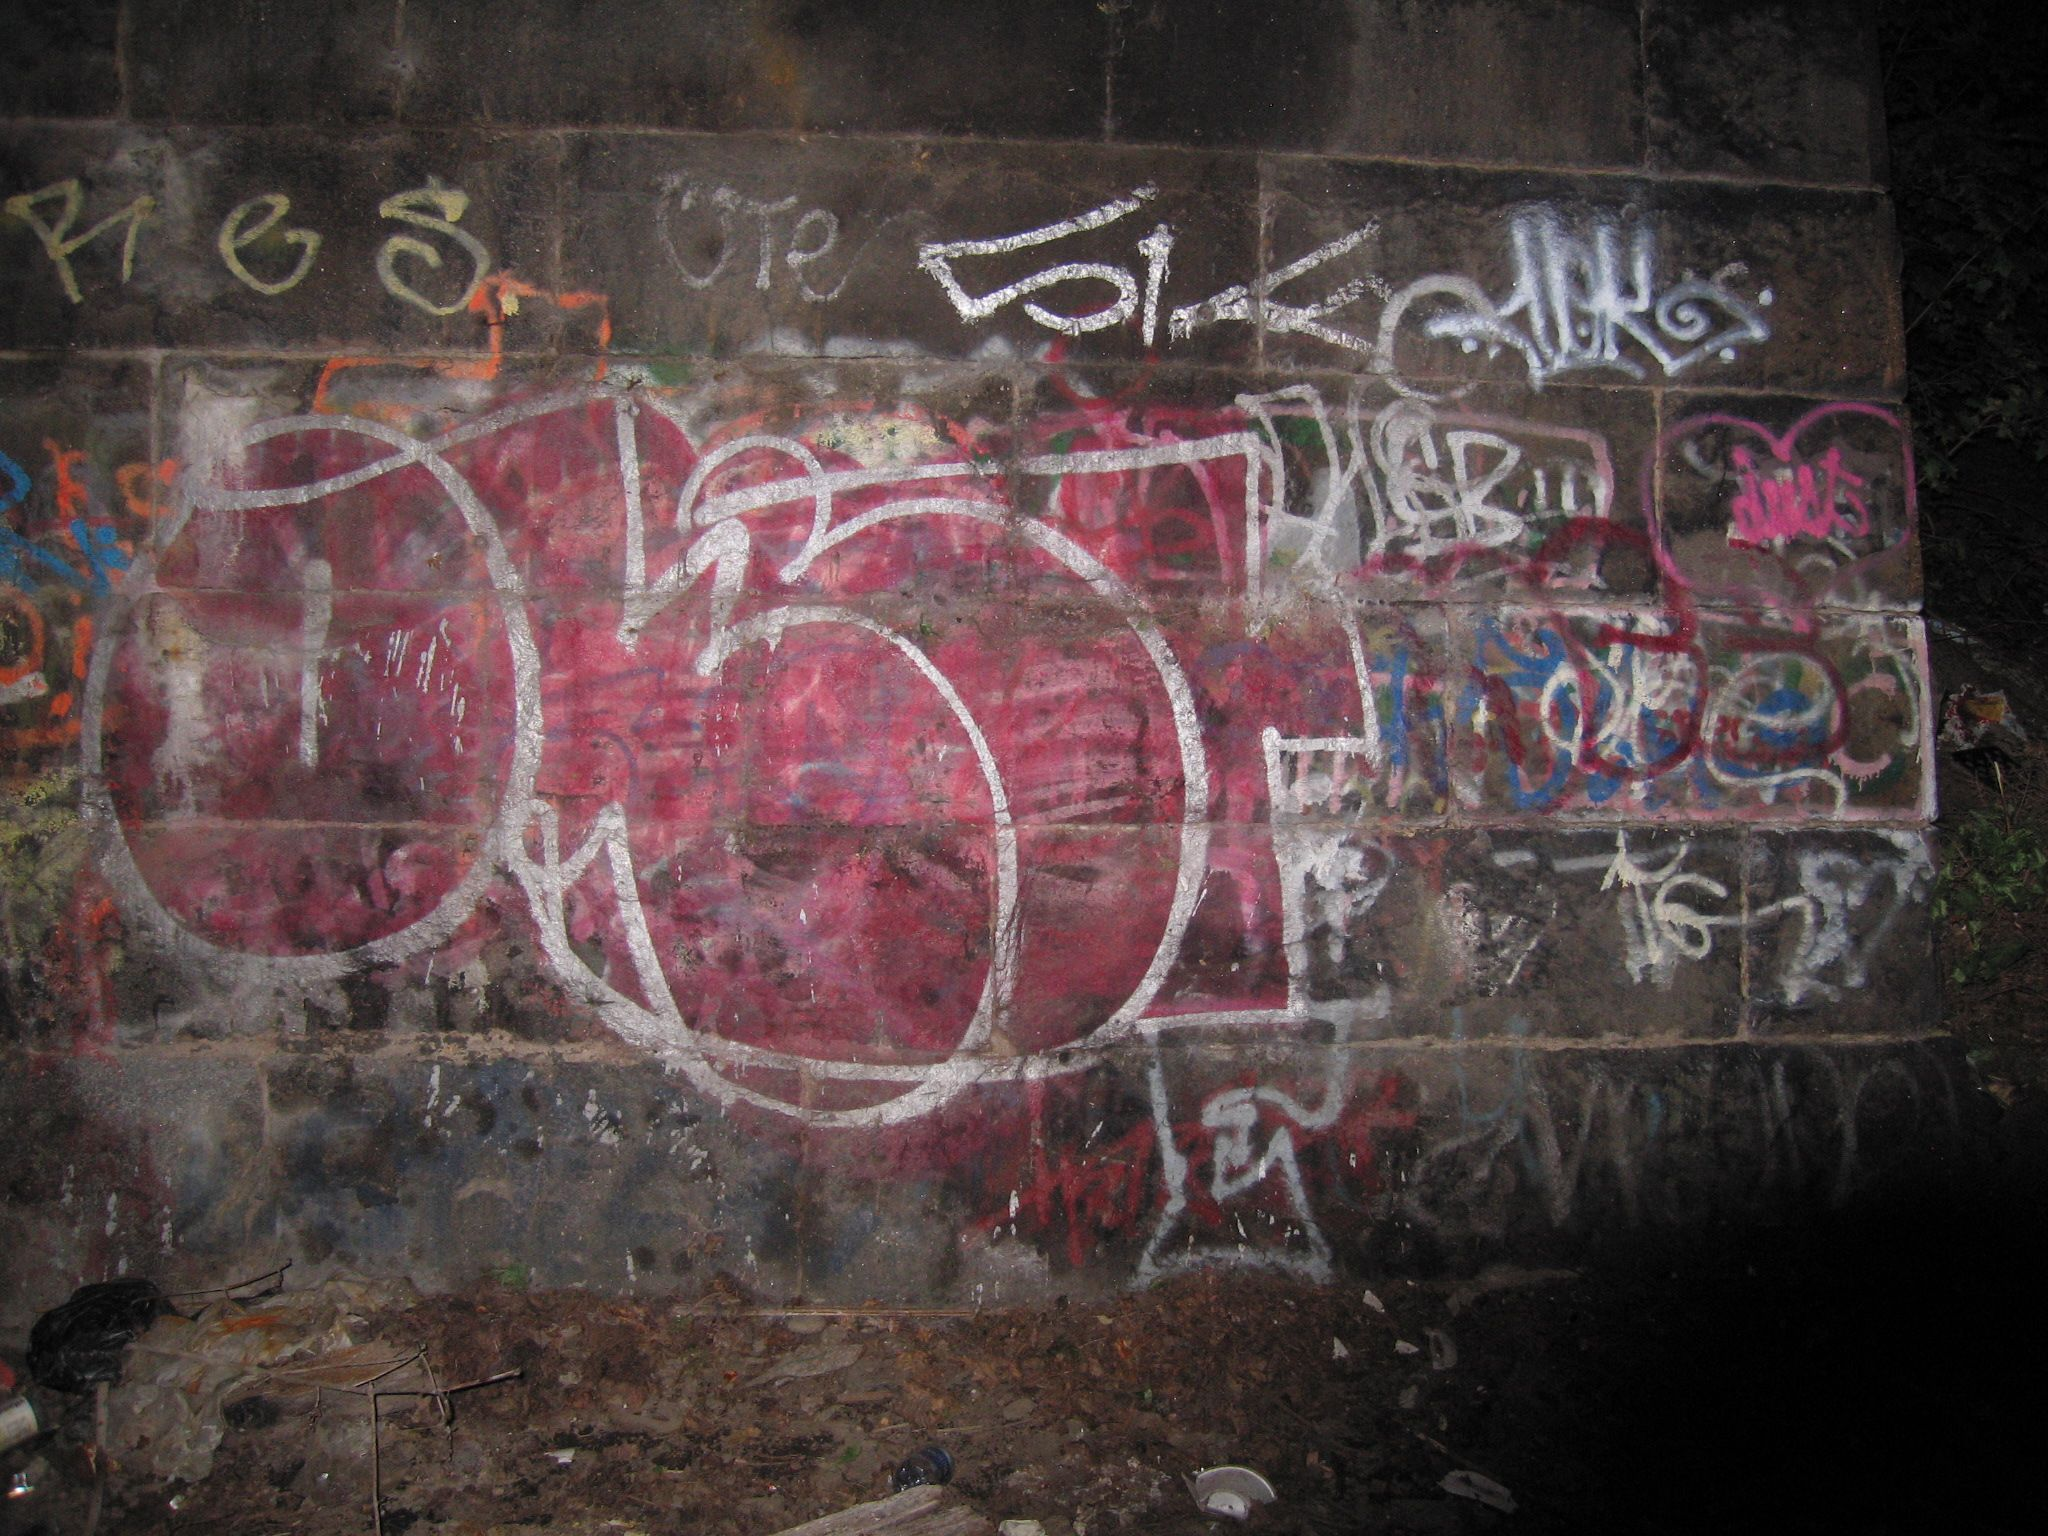 urbanartbomb #graffiti #bombing #graff #streetart - http://urbanartbomb.com/21902416/ -  - Urban Art Bomb